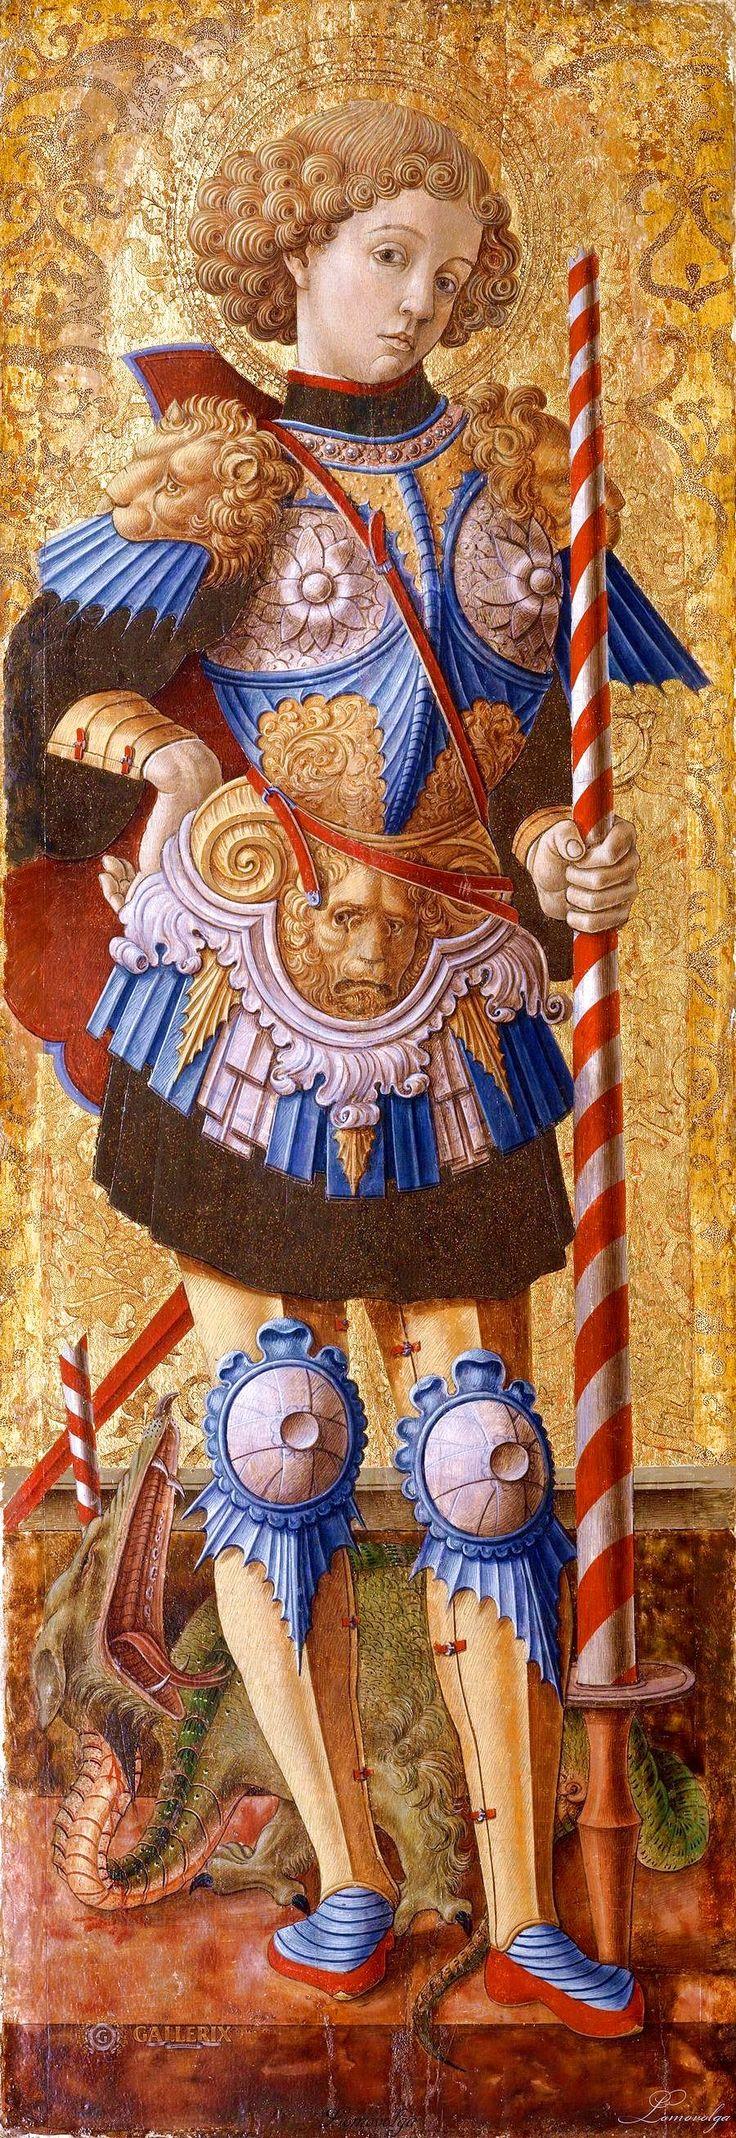 Карло Кривелли, известен с 1457 - умер 1493 Асколи-Пичено) Святой Георгий талия, Венеция (1472; Темпера на дереве, золотой фон; (96,5 х 33,7 см)   Музей Метрополитен